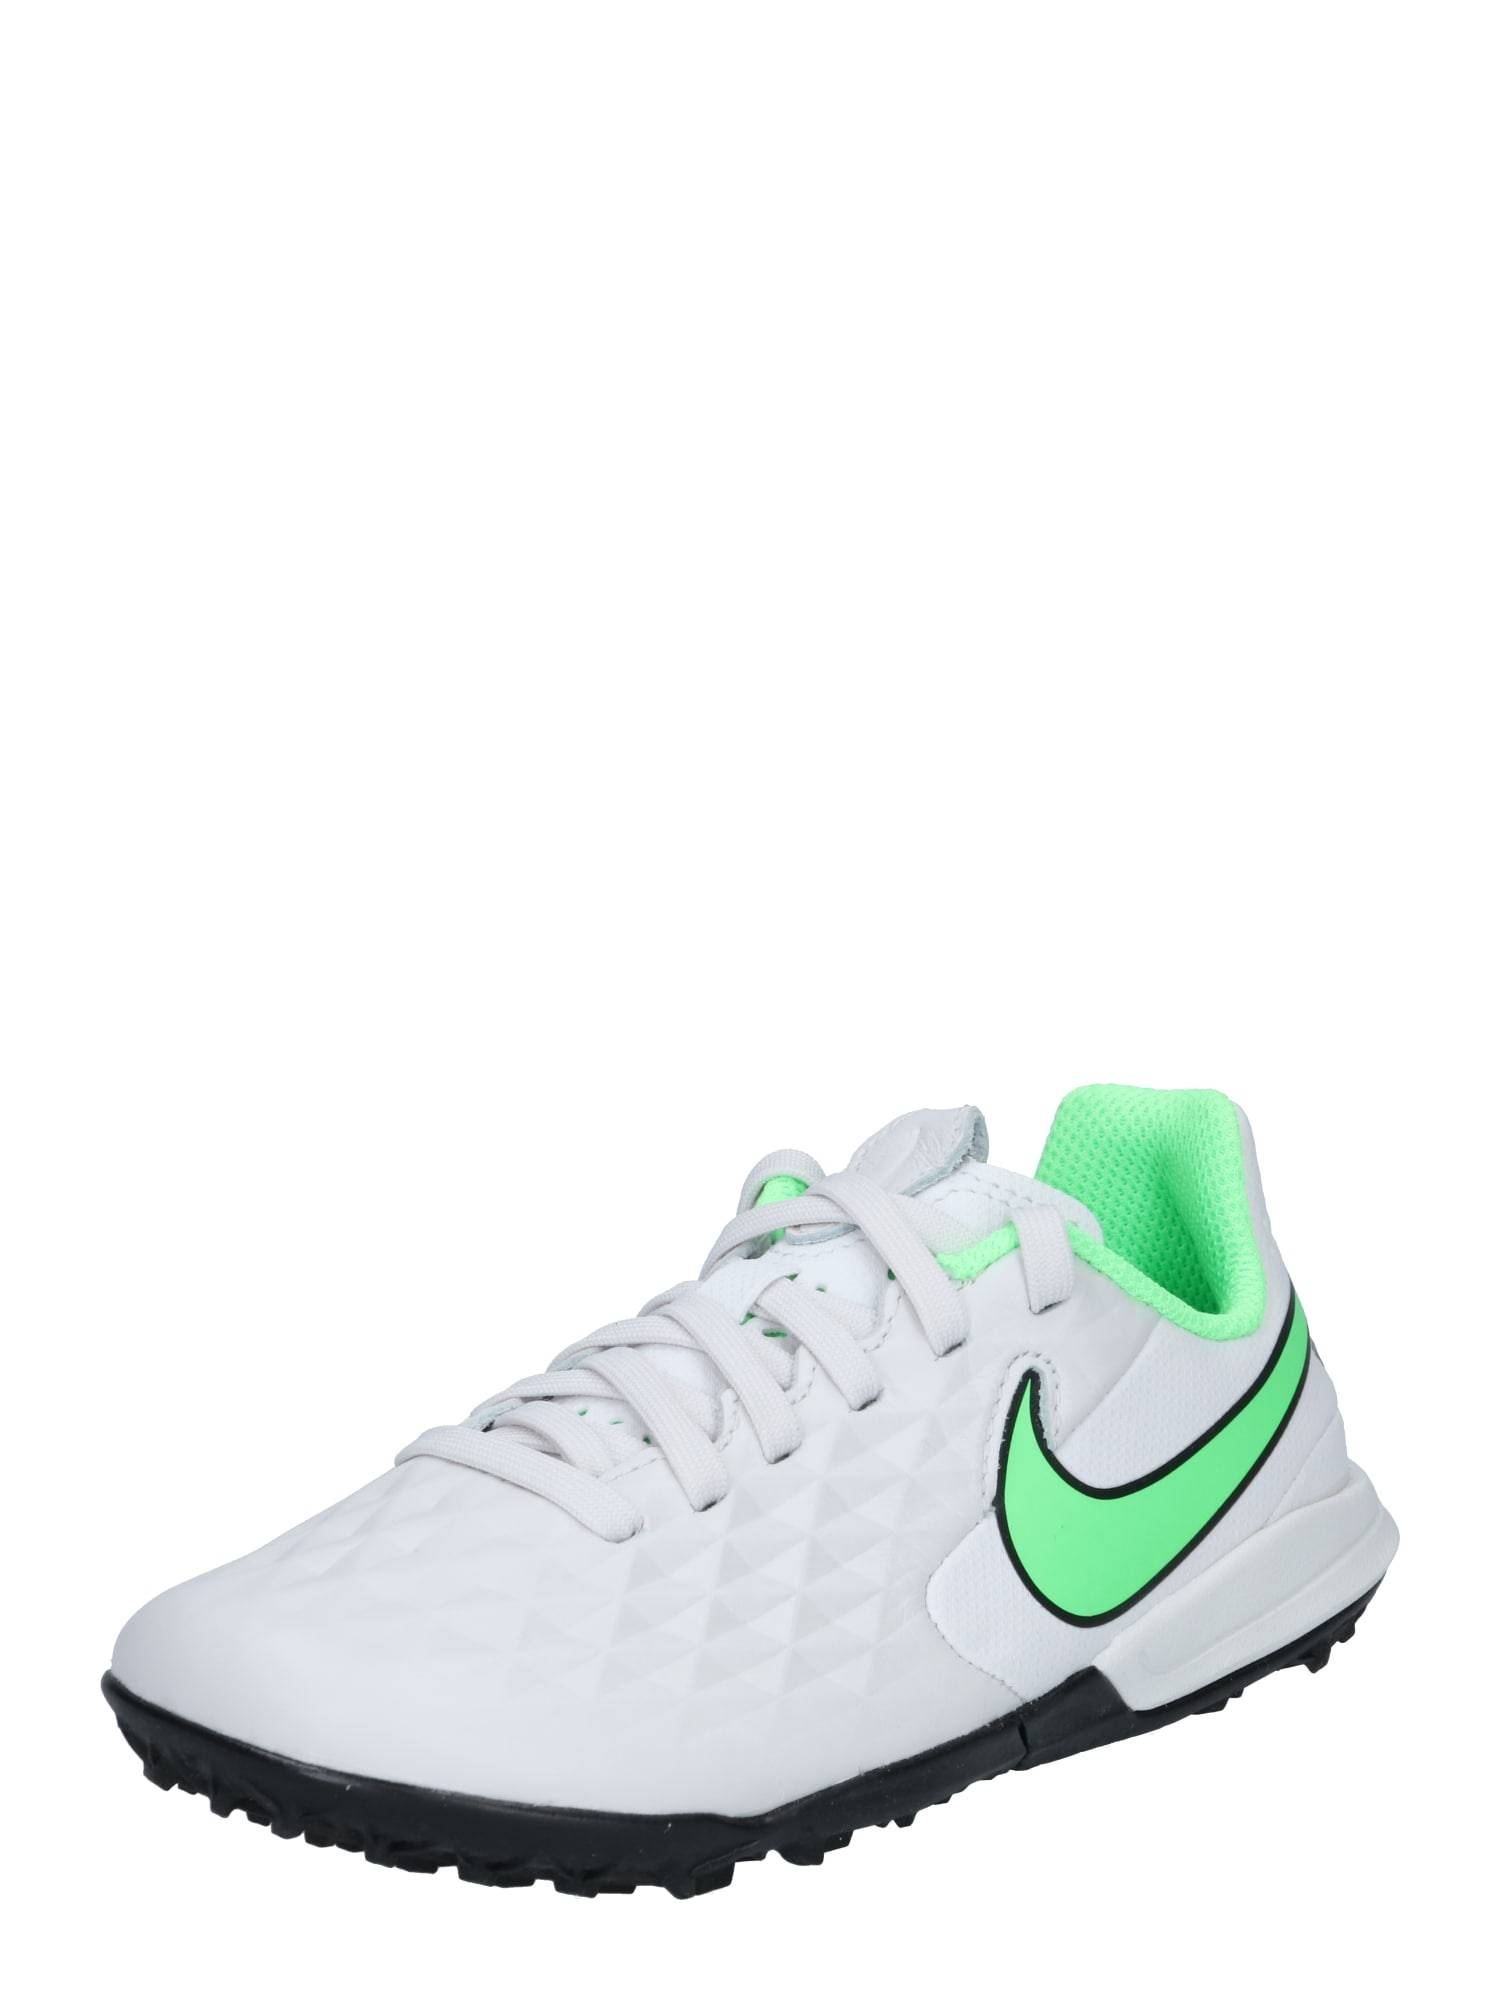 NIKE Chaussure de sport  - Blanc - Taille: 13.5C - boy